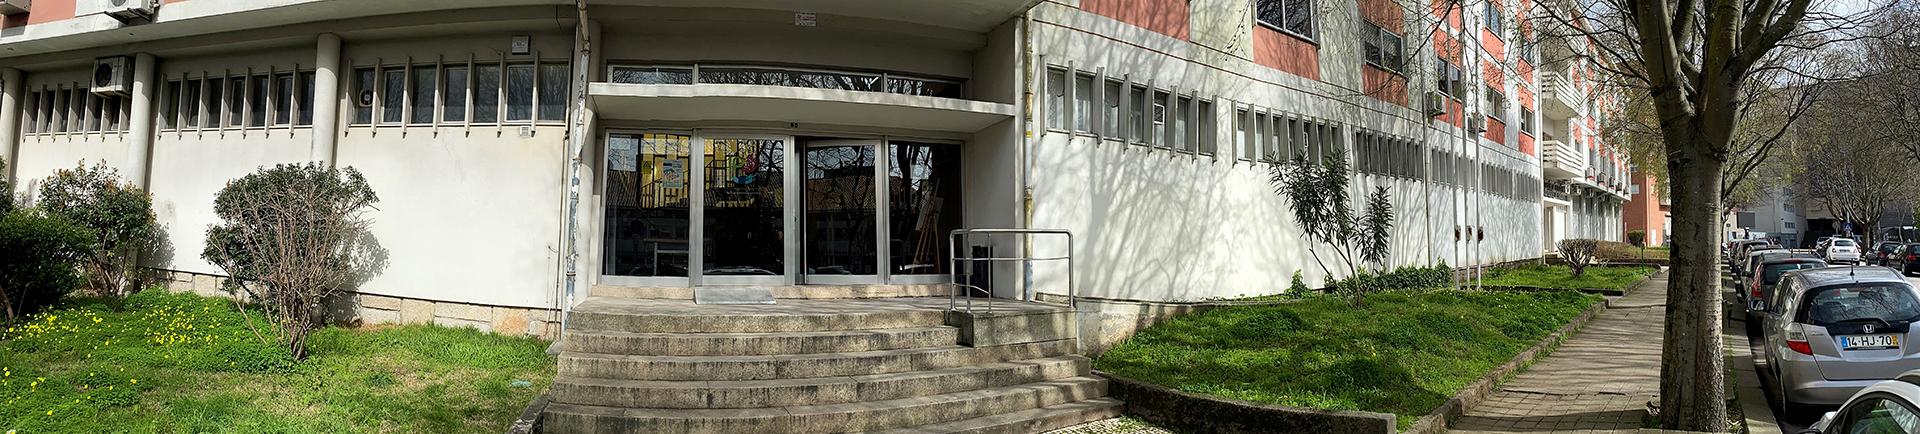 Fachada do edifício da Casa do Desporto no Porto